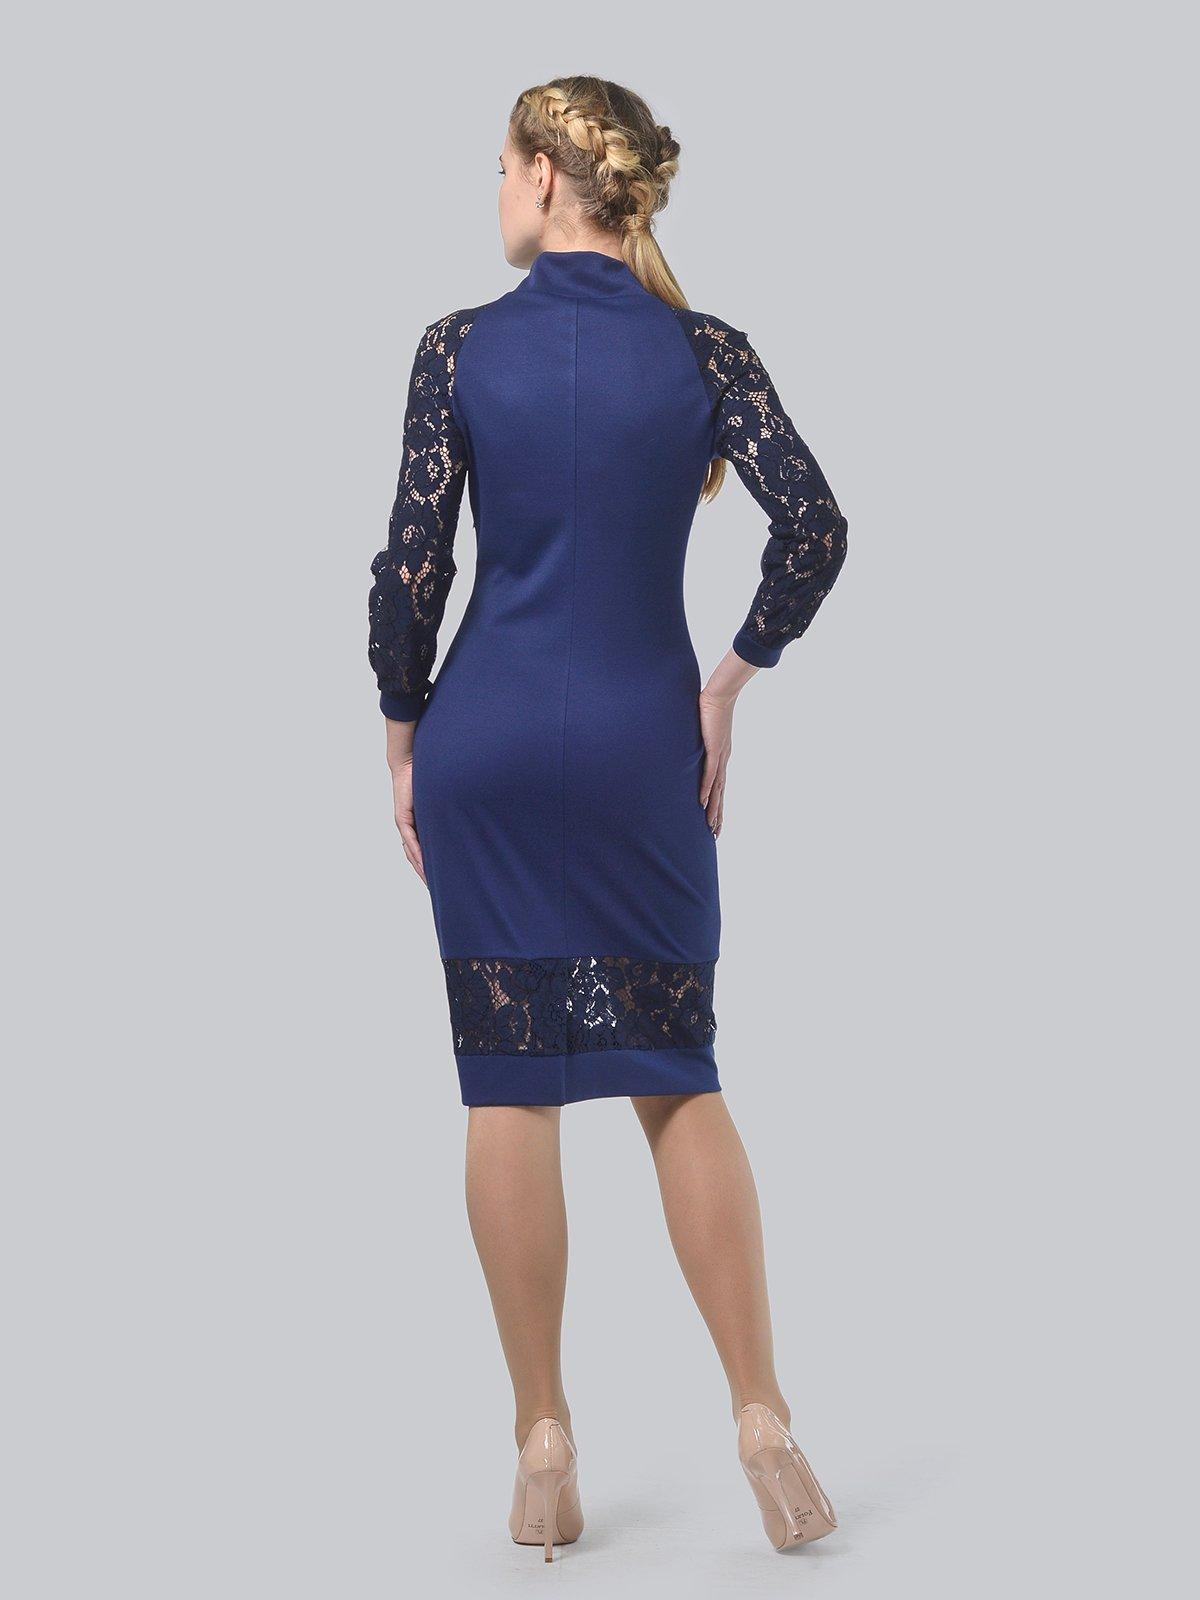 Платье темно-синее   3939904   фото 3